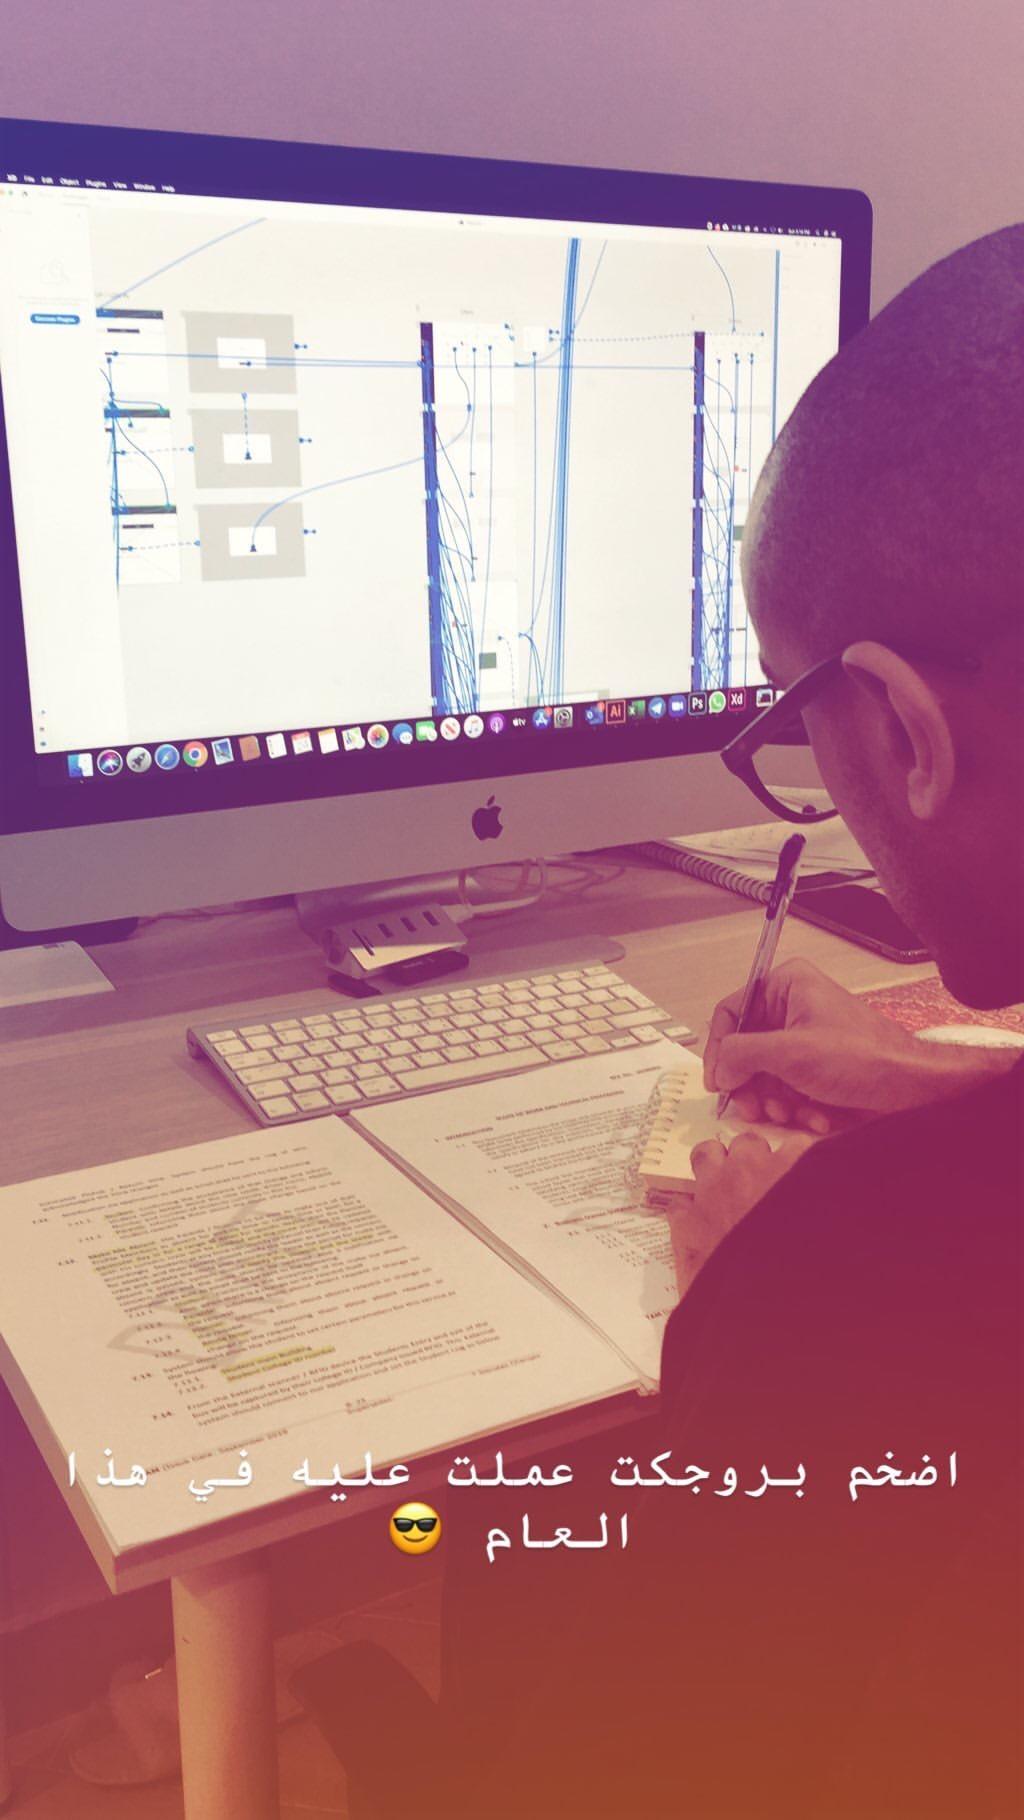 Decodeica web design process